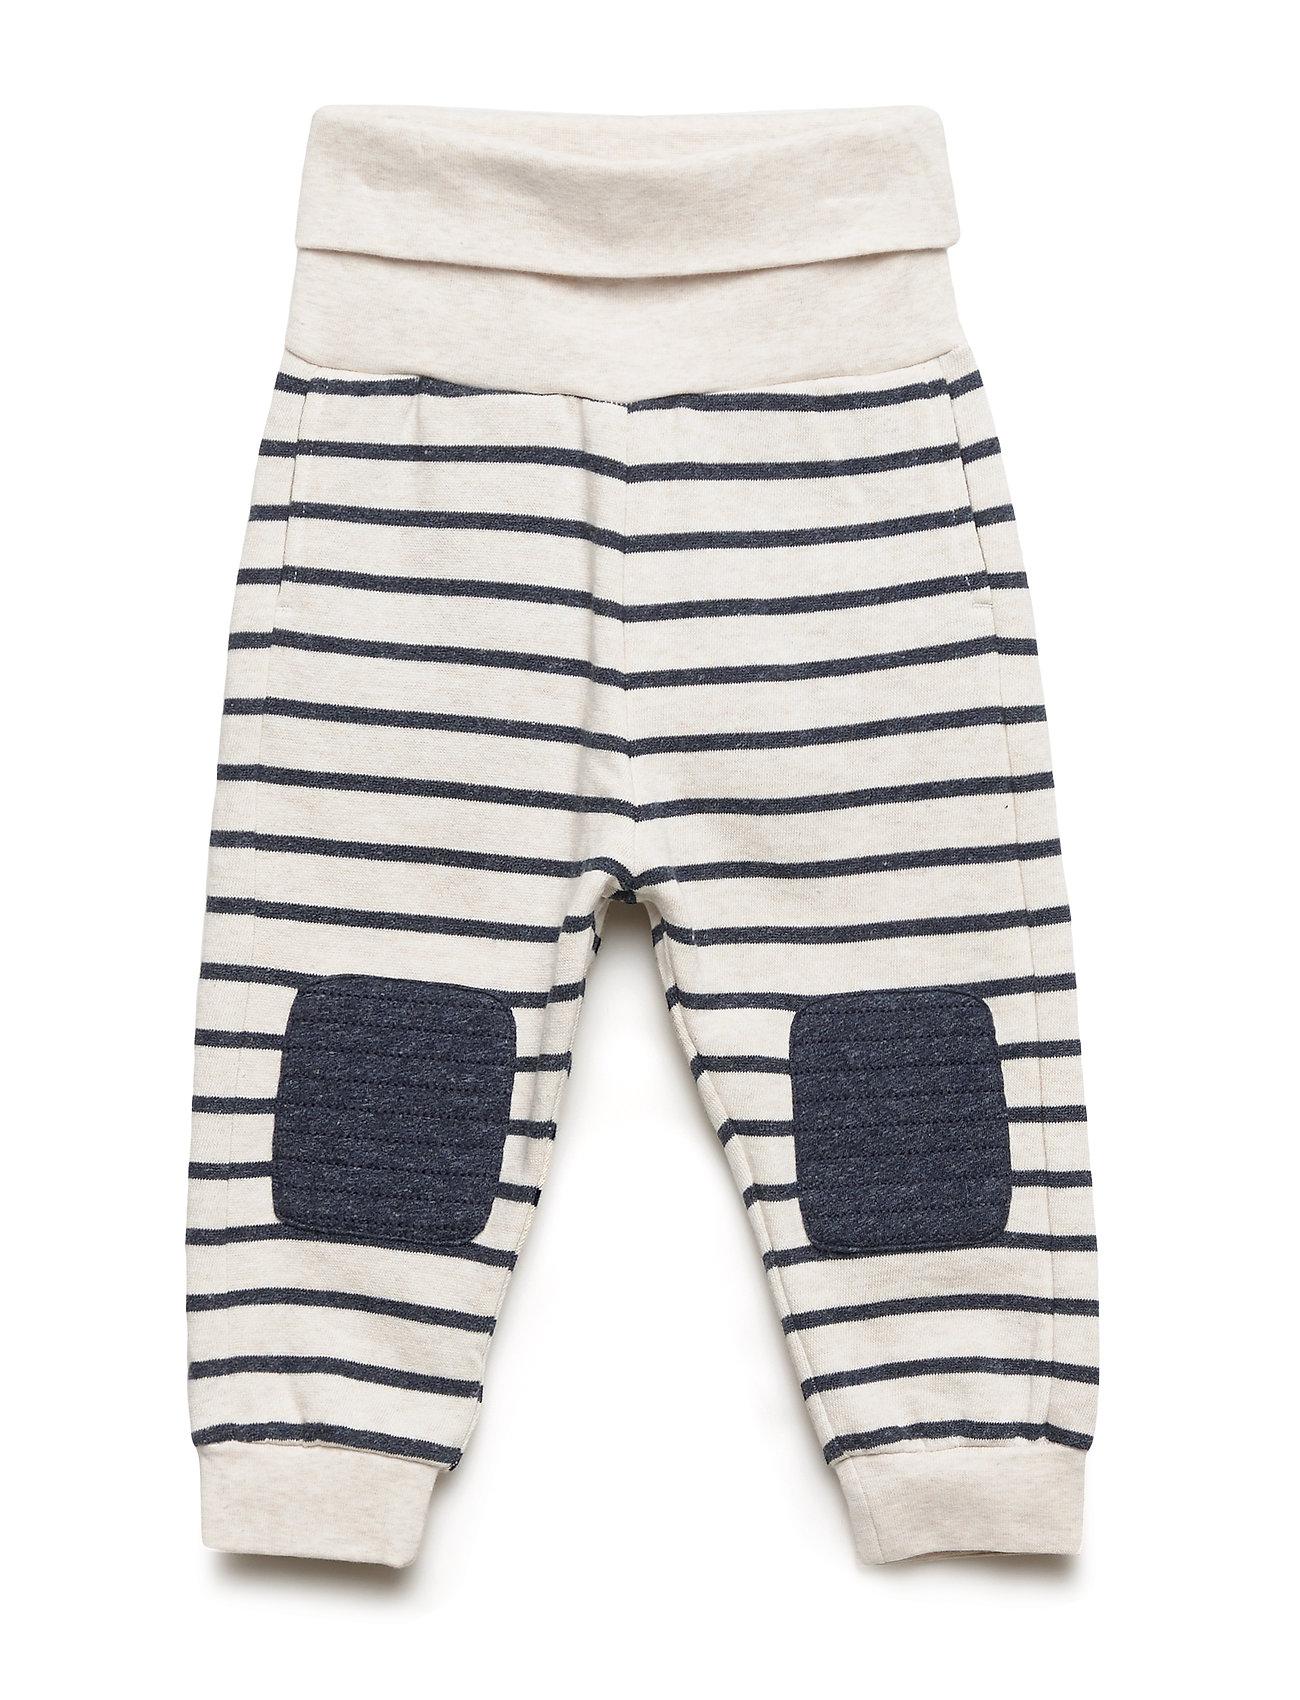 Polarn O. Pyret Trouser Jersey Striped Baby - ECRU MELANGE